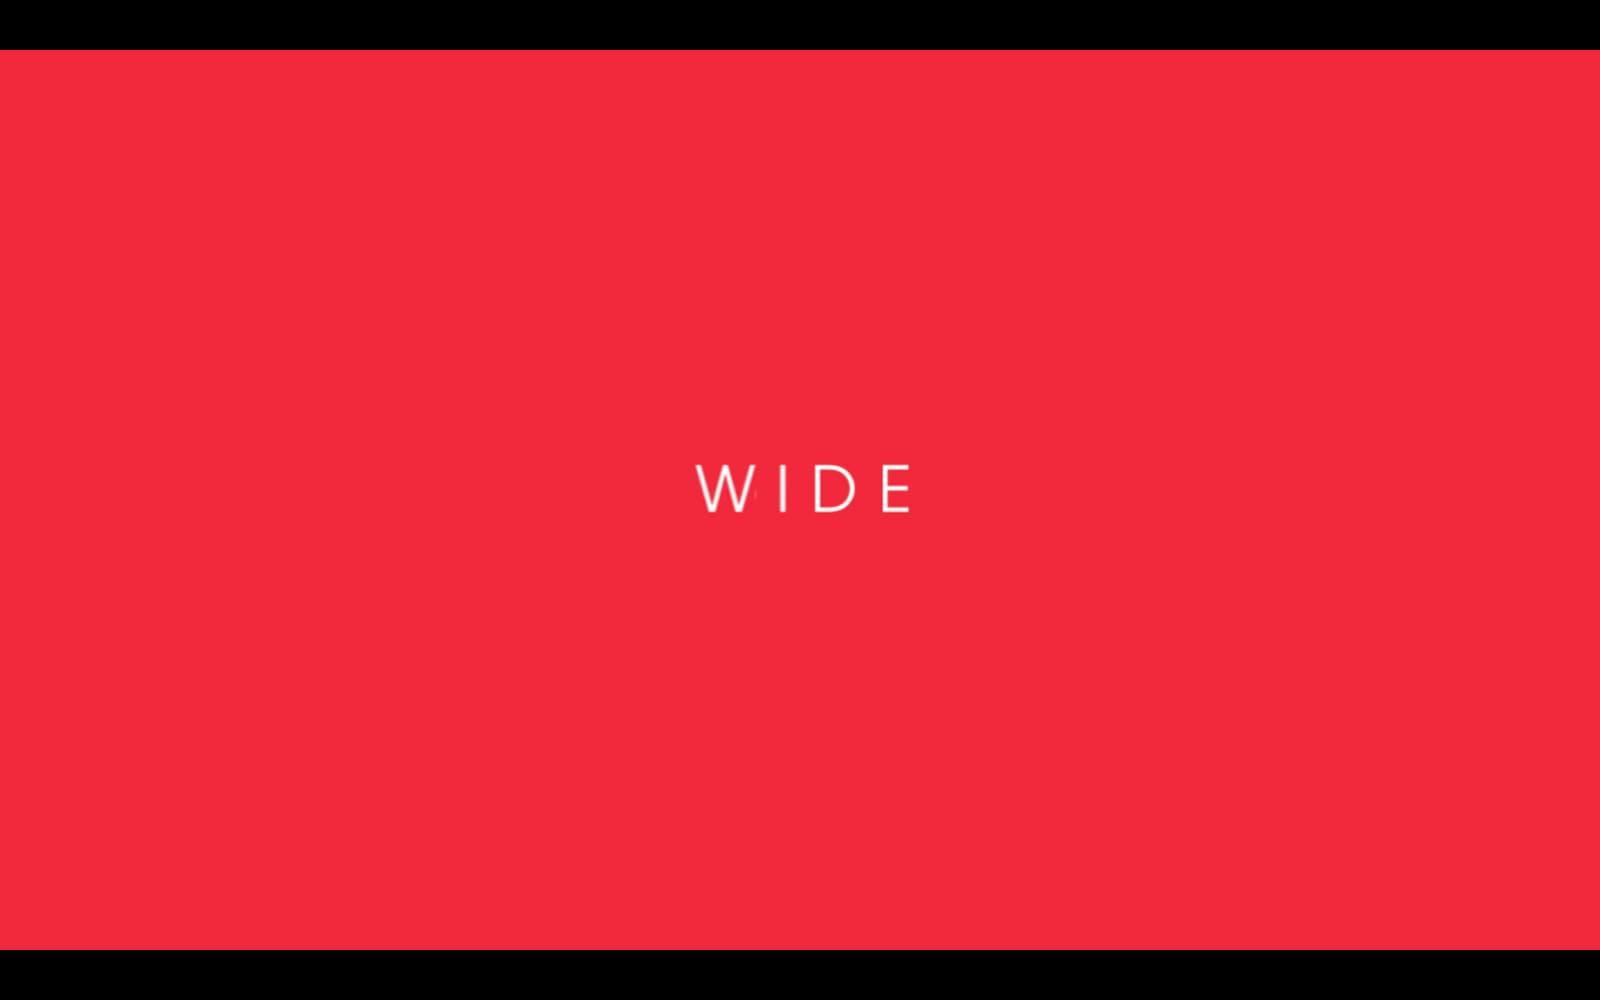 fla_wide_11